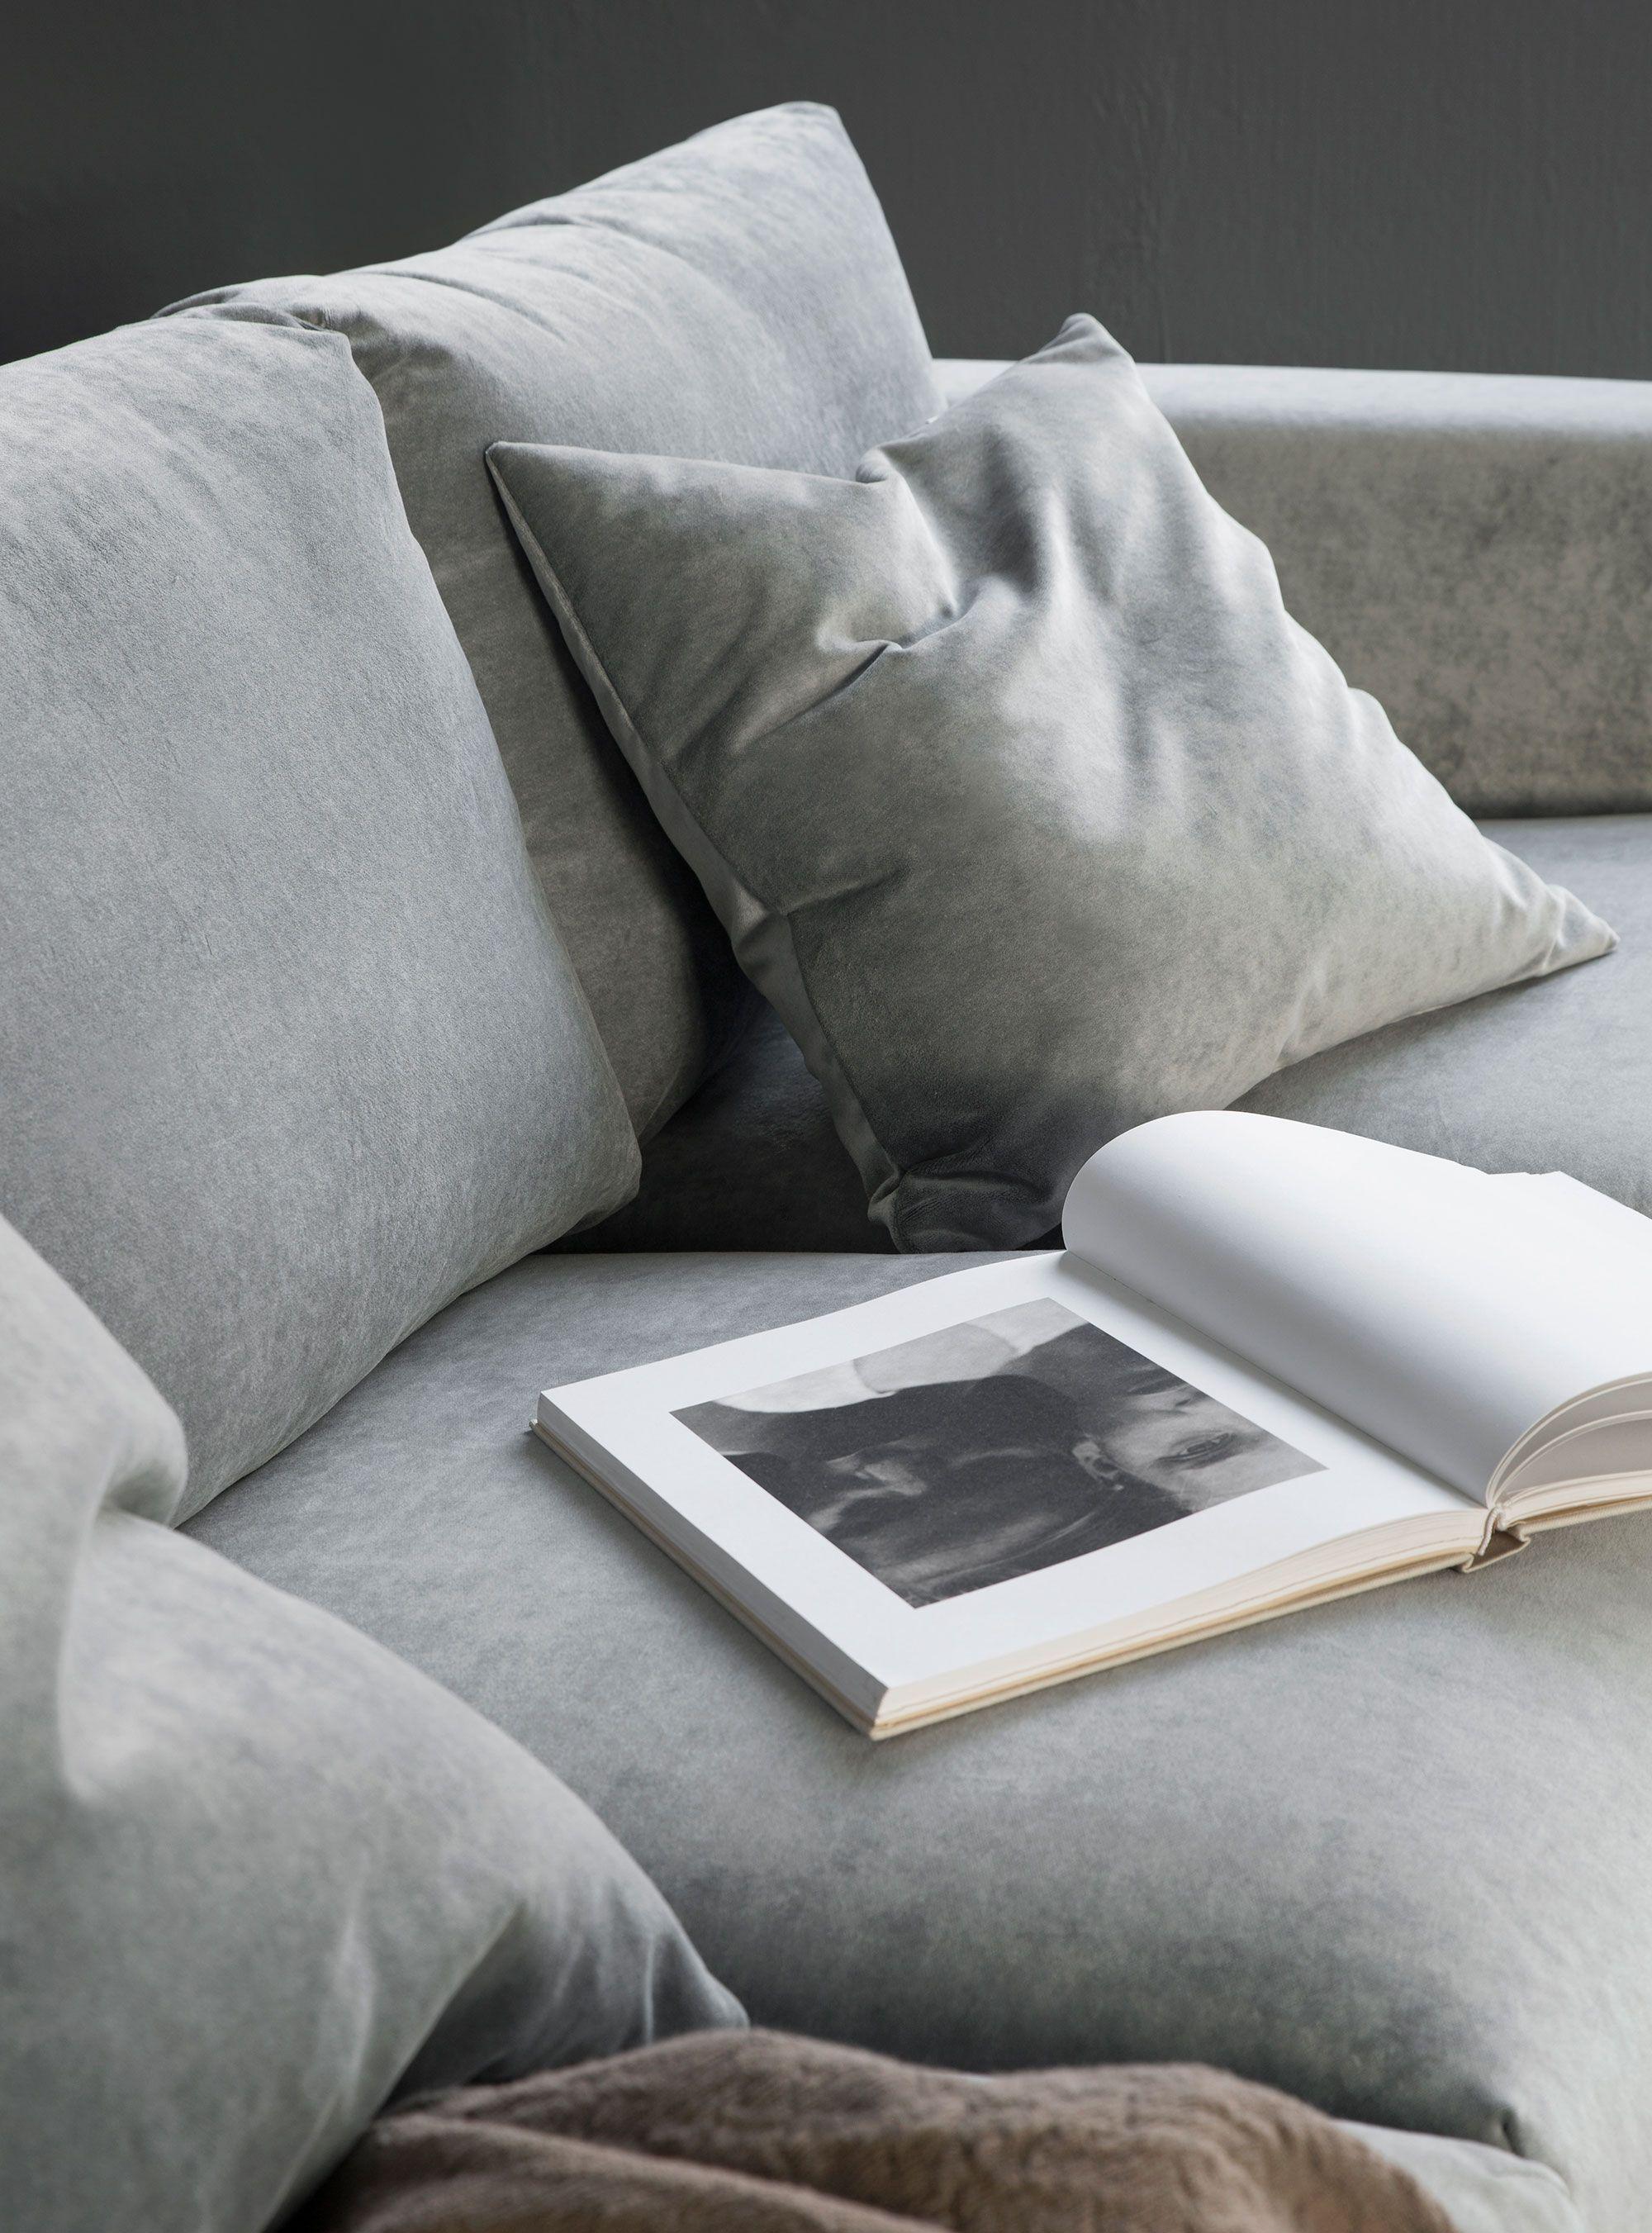 Moody Shades Grey Velvet Sofa Scandinavian Minimalism Ikea Vimle Sofa With A Bemz Cover In Zinc Grey Malmen Velve Sofa Covers Ikea Vimle Sofa Velvet Sofa